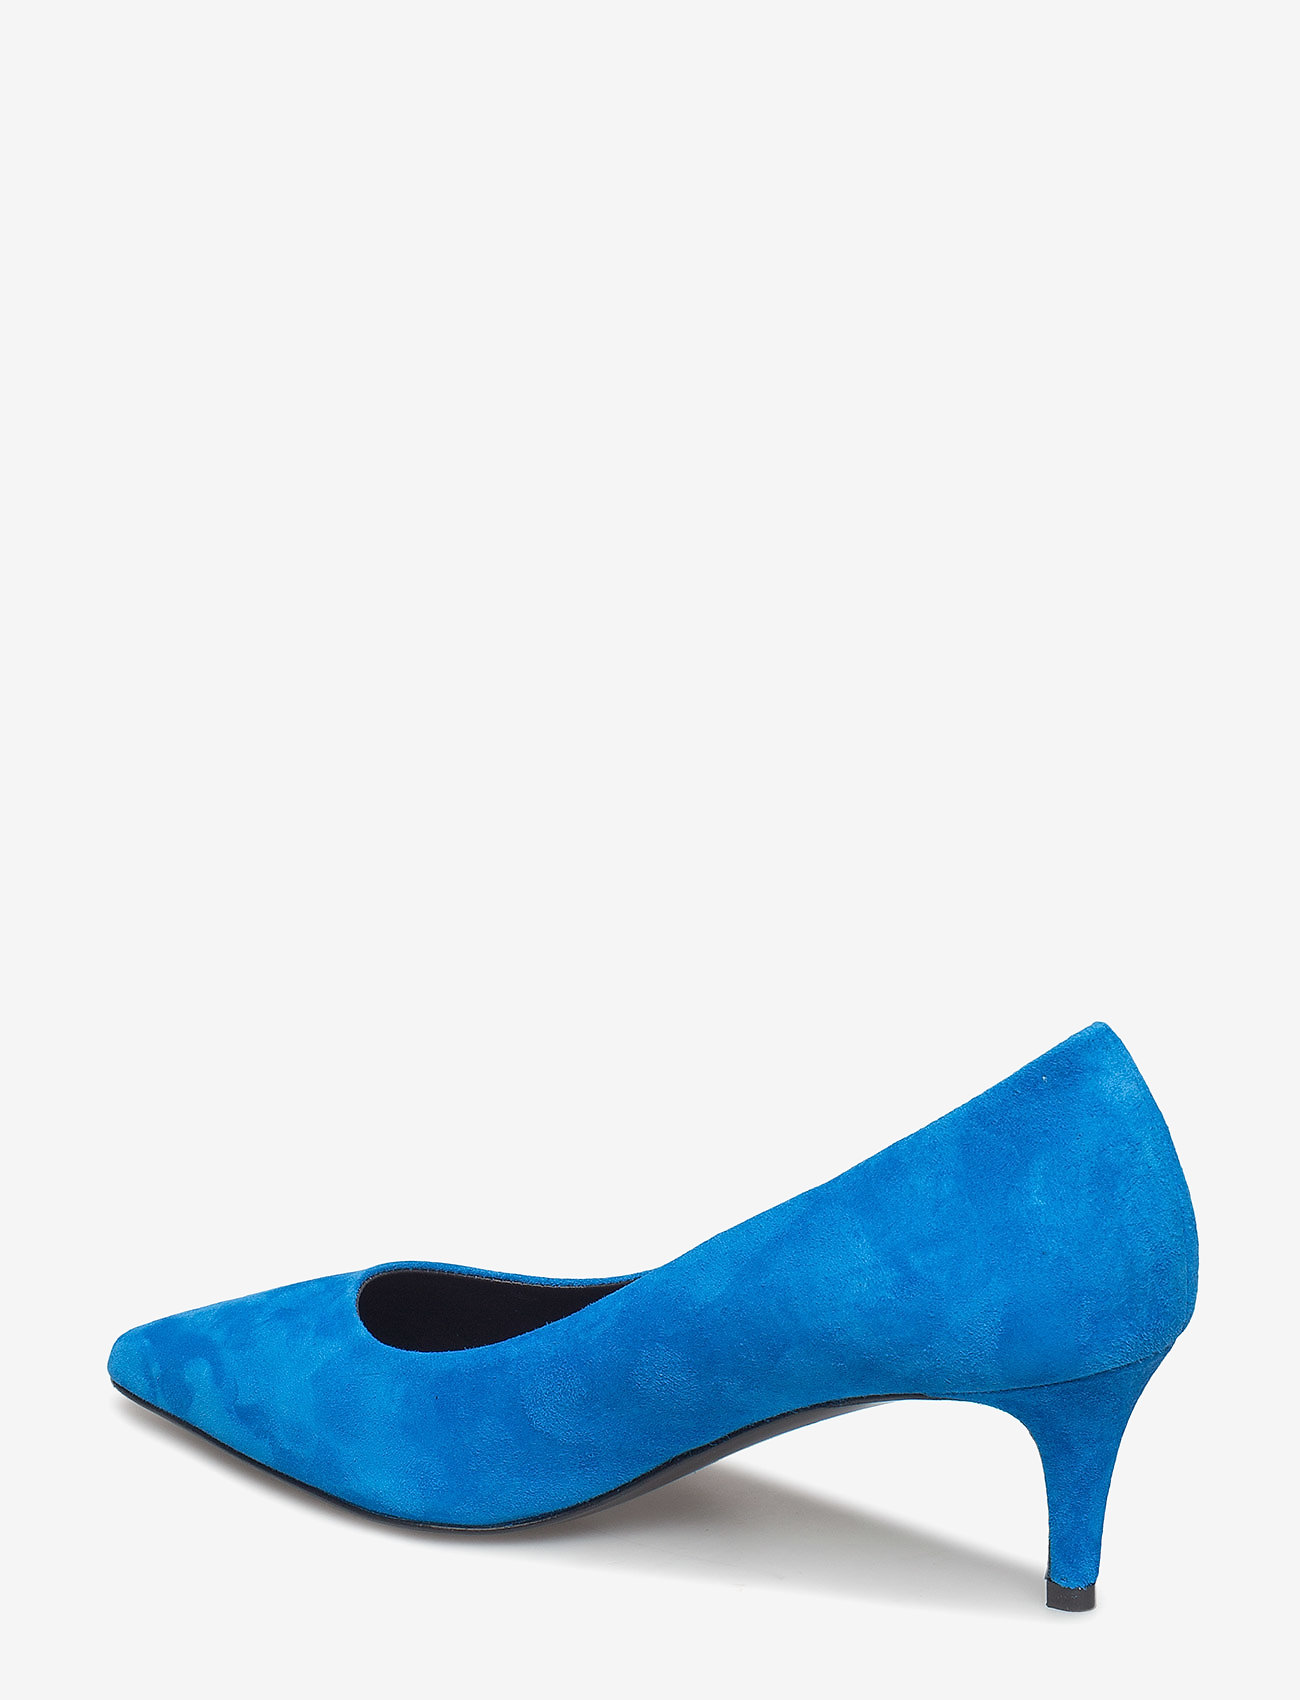 Laximini (Casual Blue) - By Malene Birger